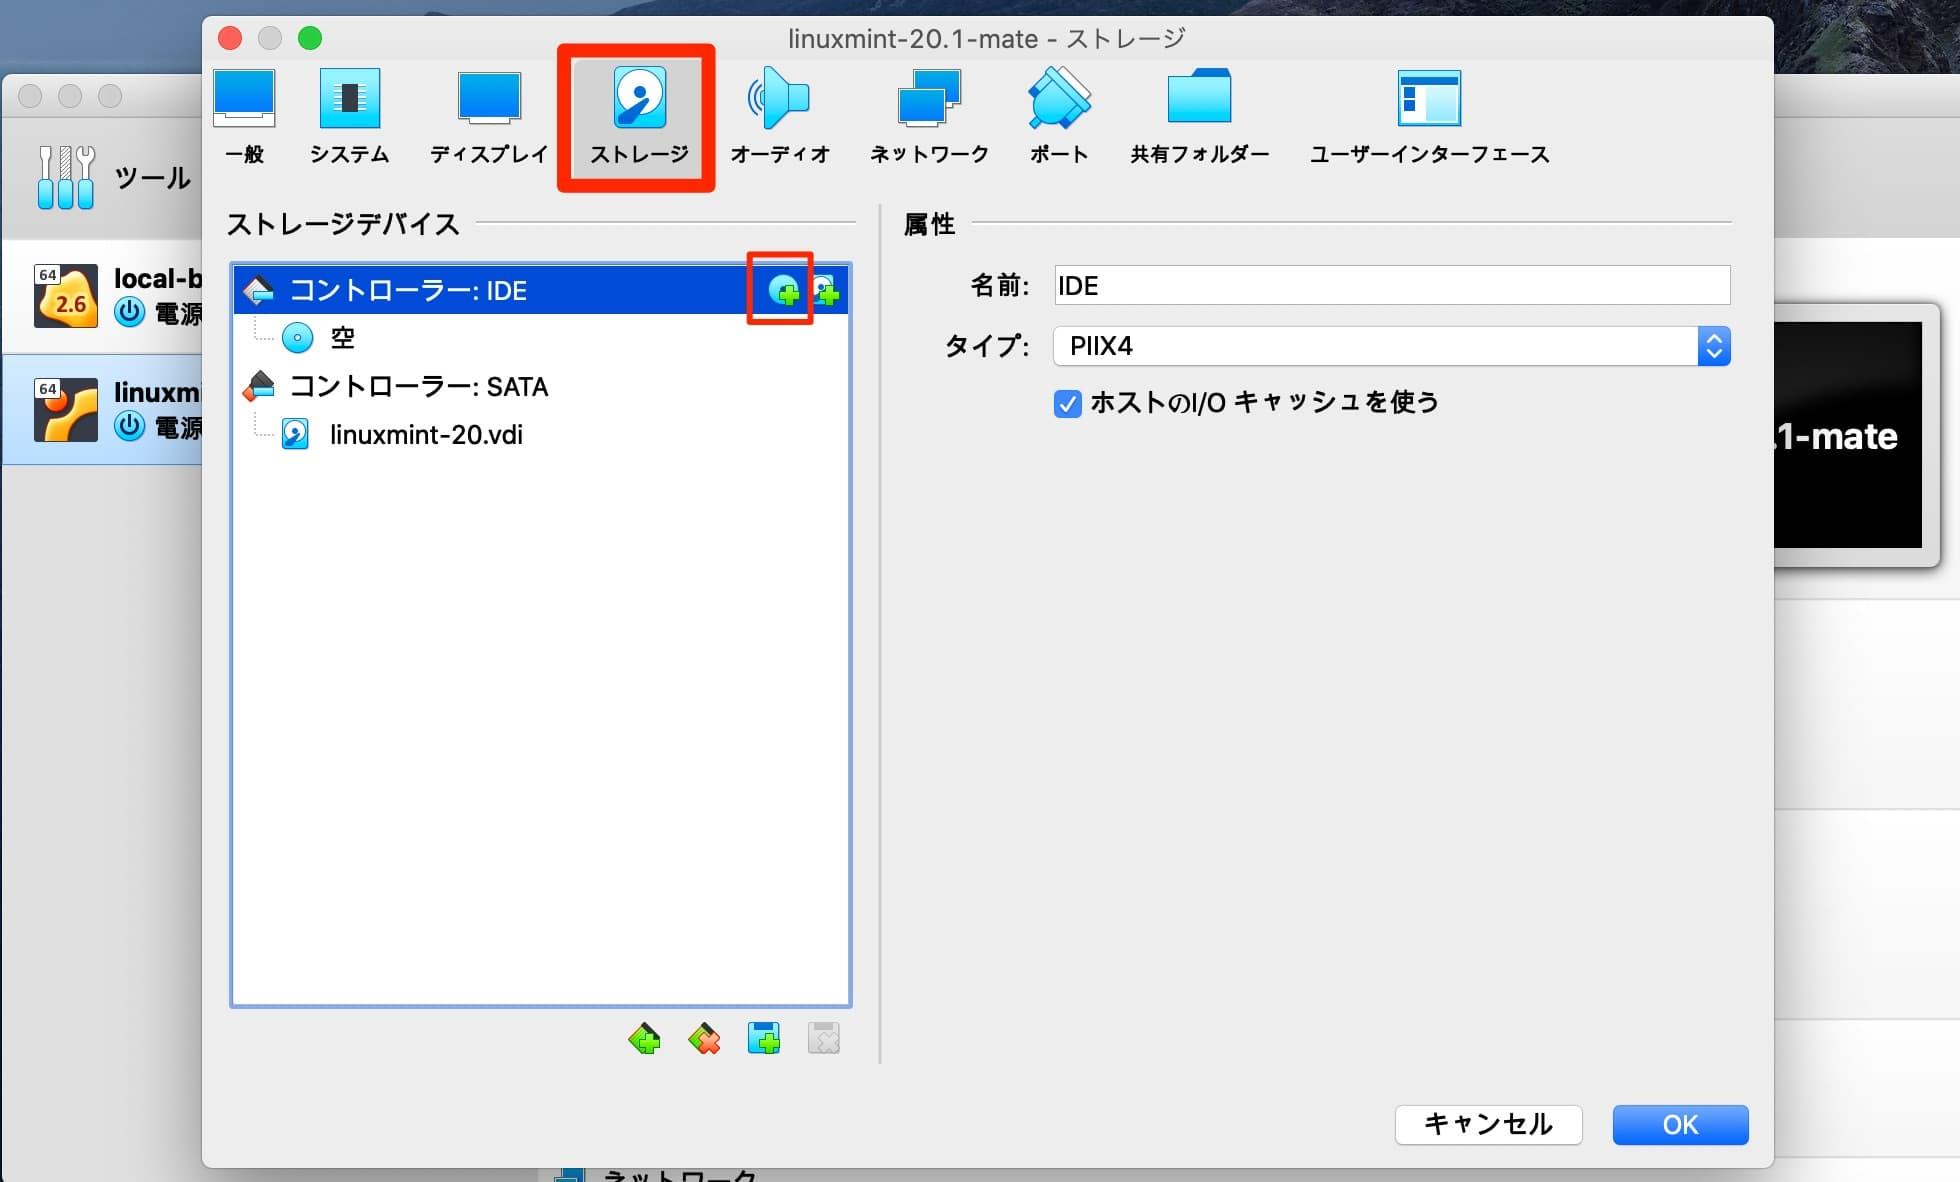 virtualboxでlinuxmintを設定する